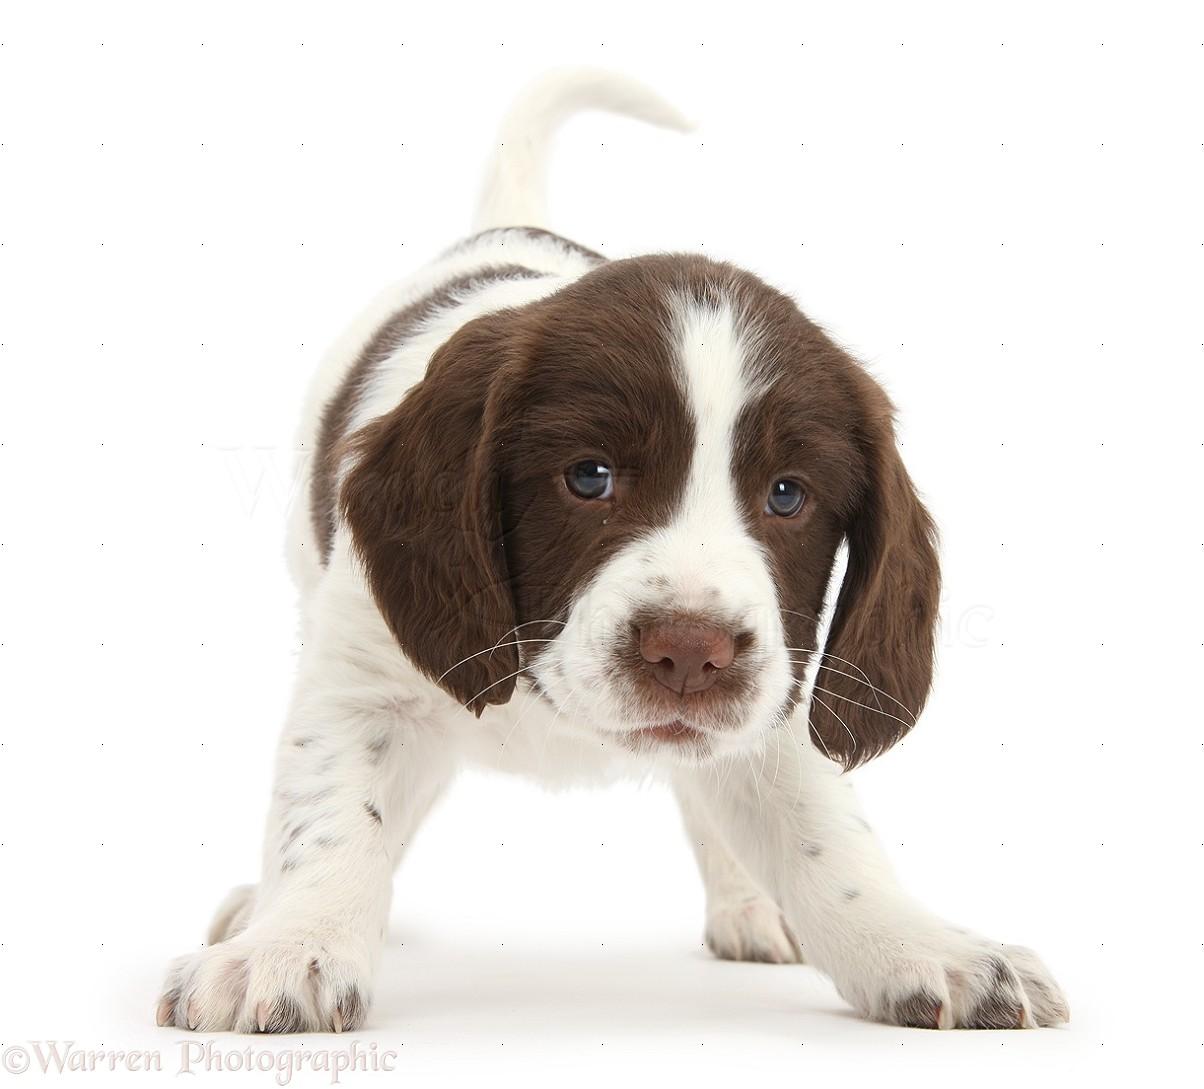 Dog: Working English Springer Spaniel puppy photo WP39810